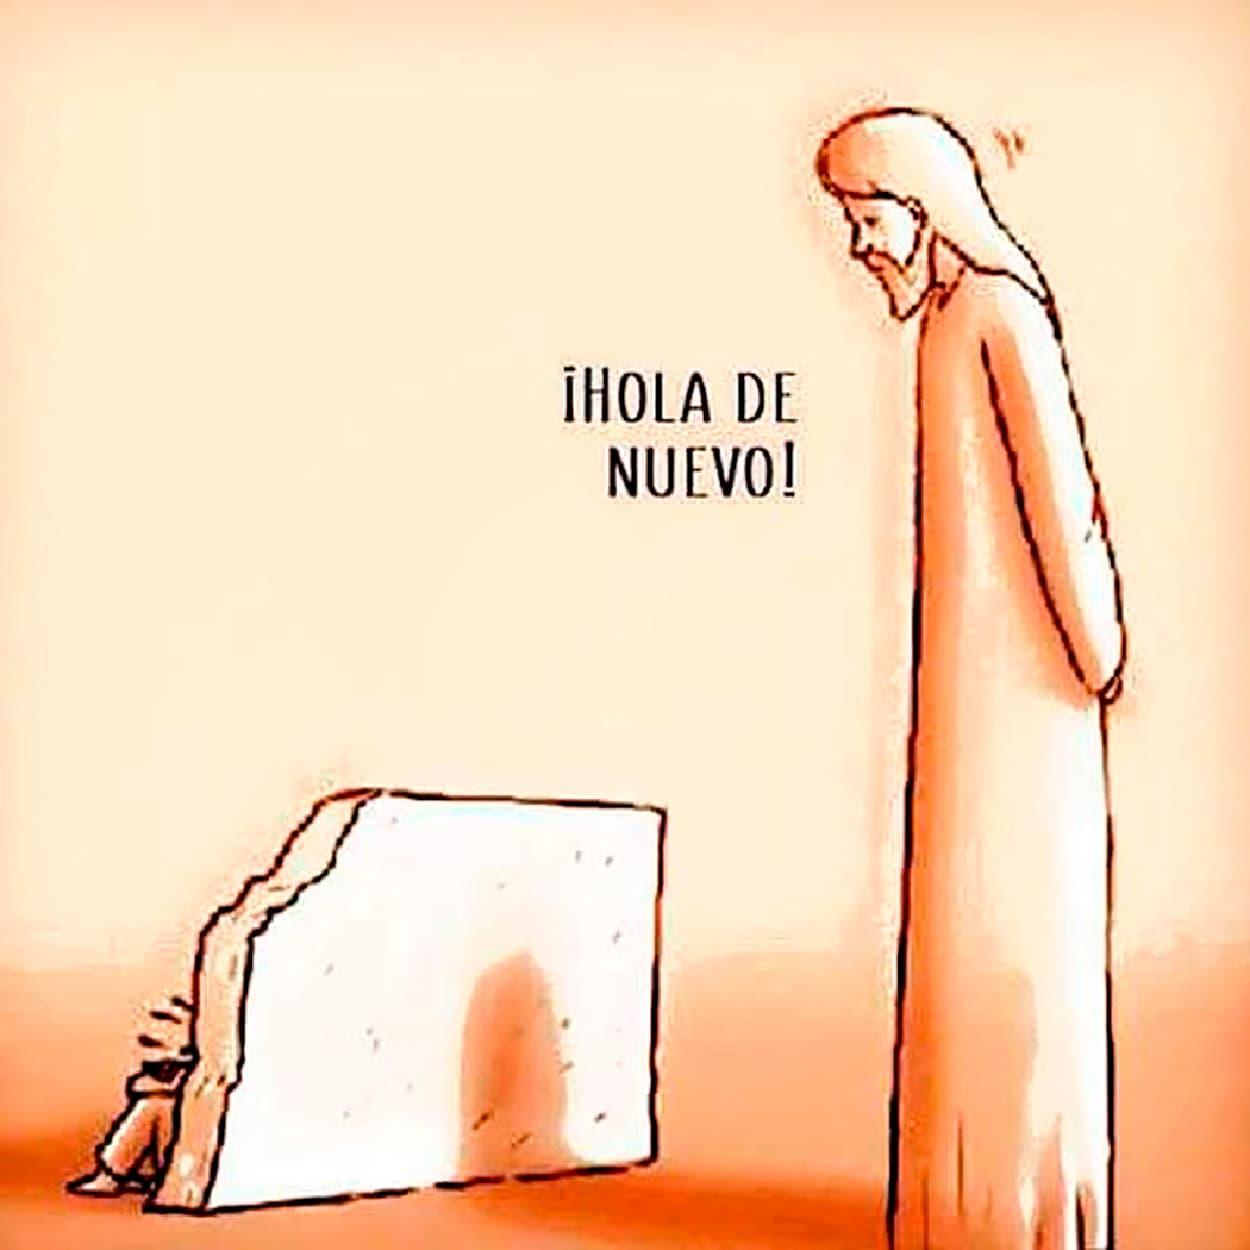 Jesús siempre esta ahí